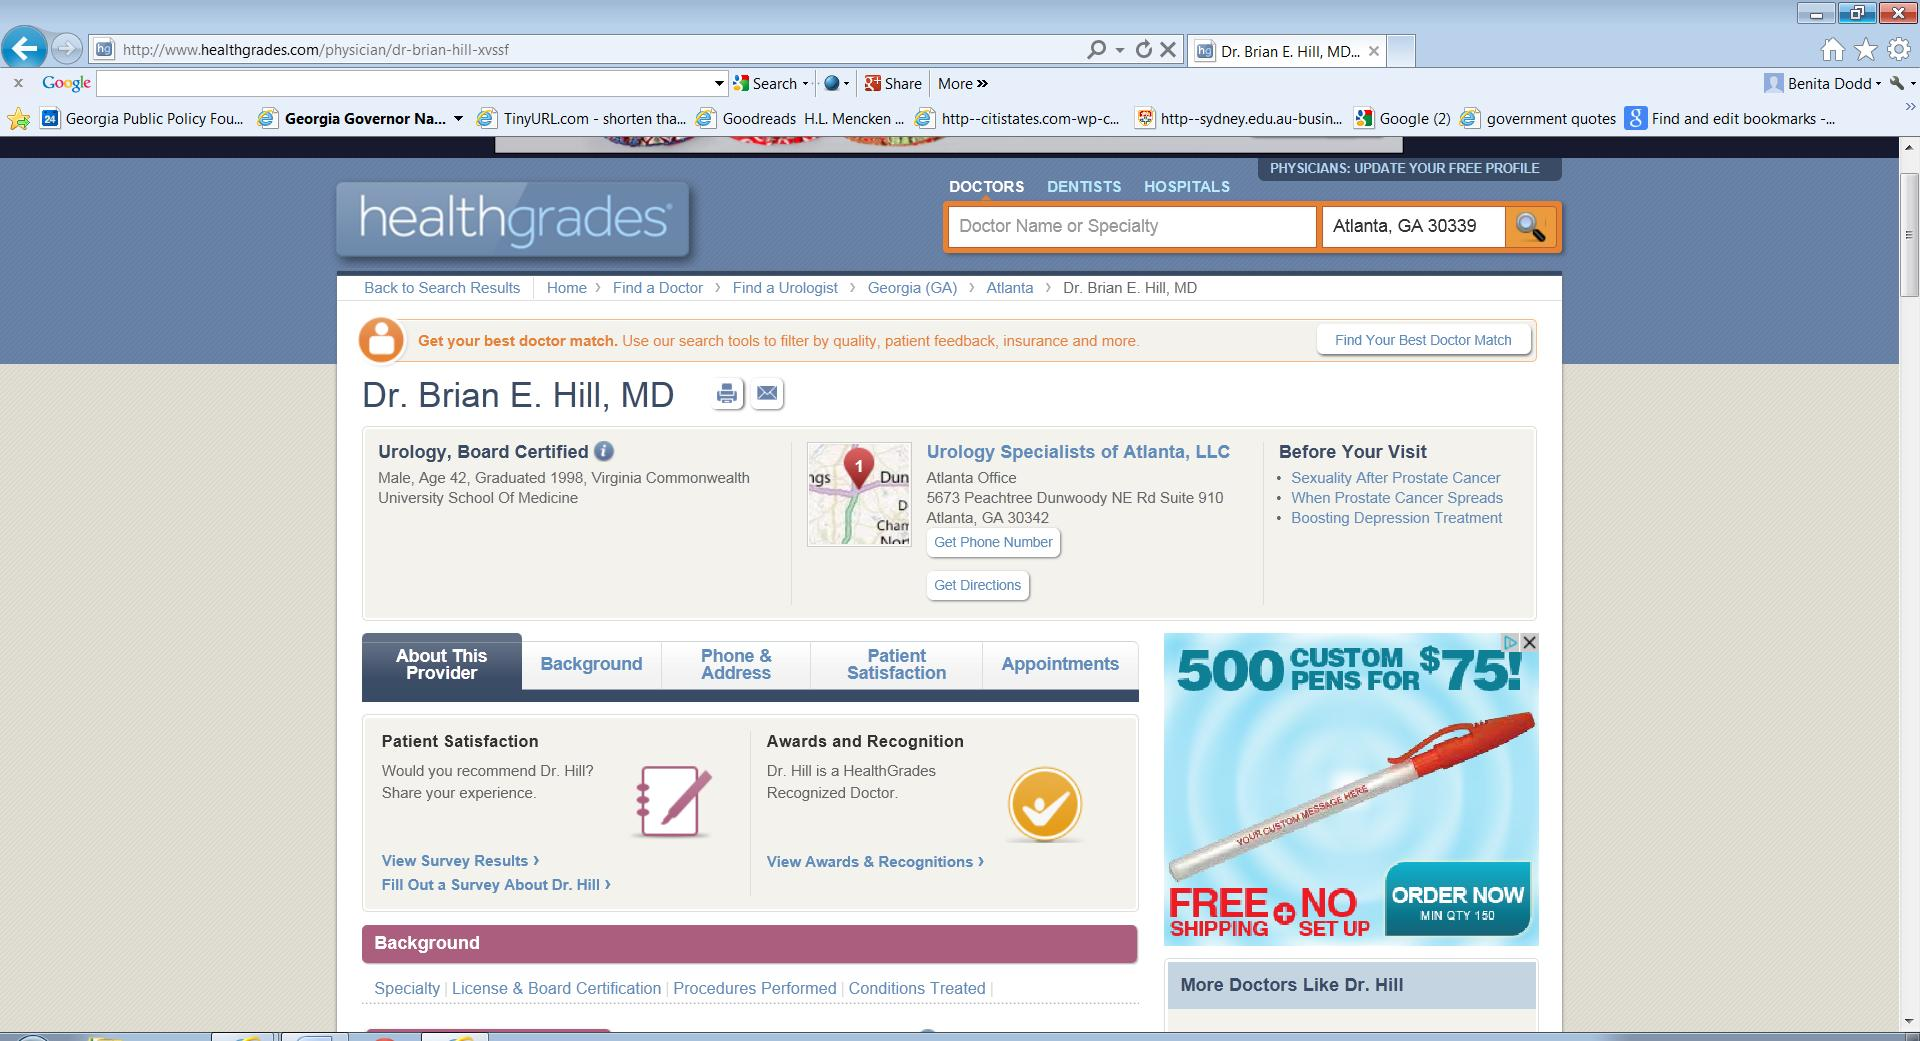 www.healthgrades.com